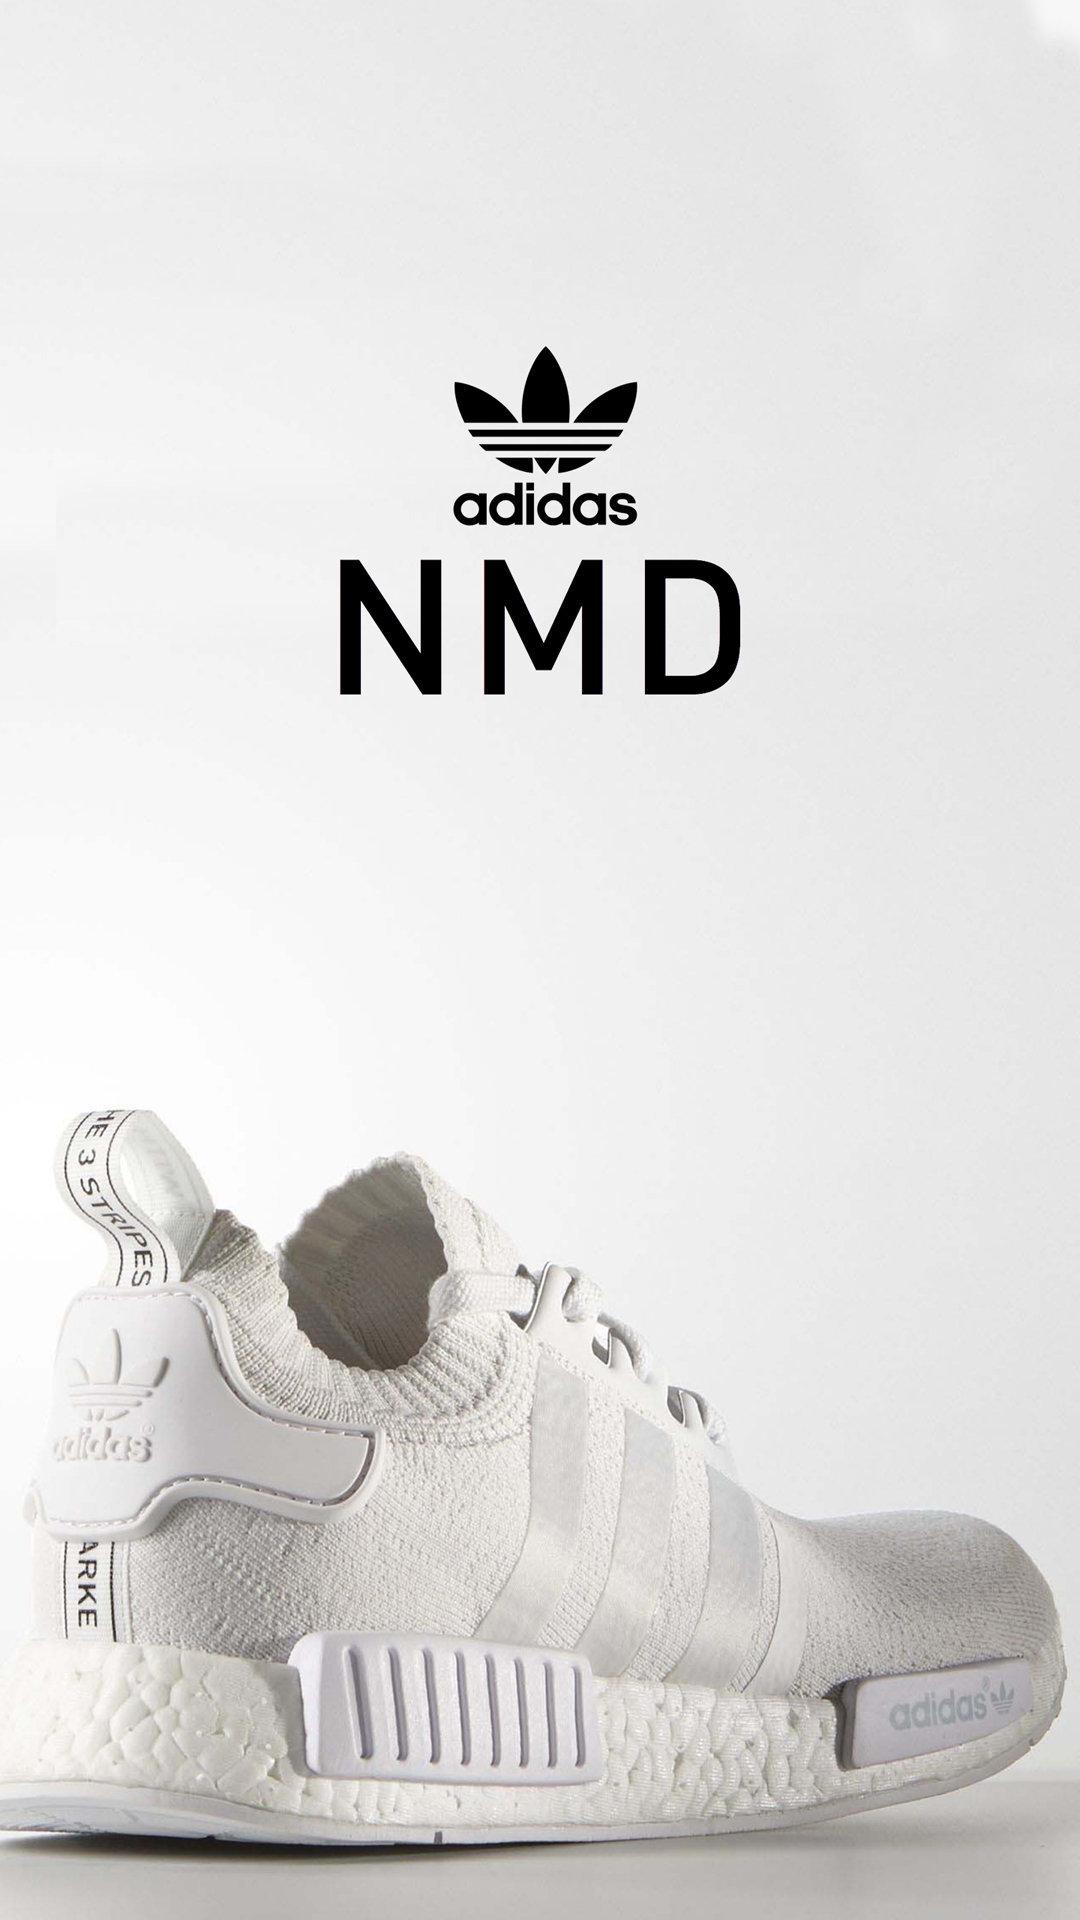 Adidas Shoes Wallpaper